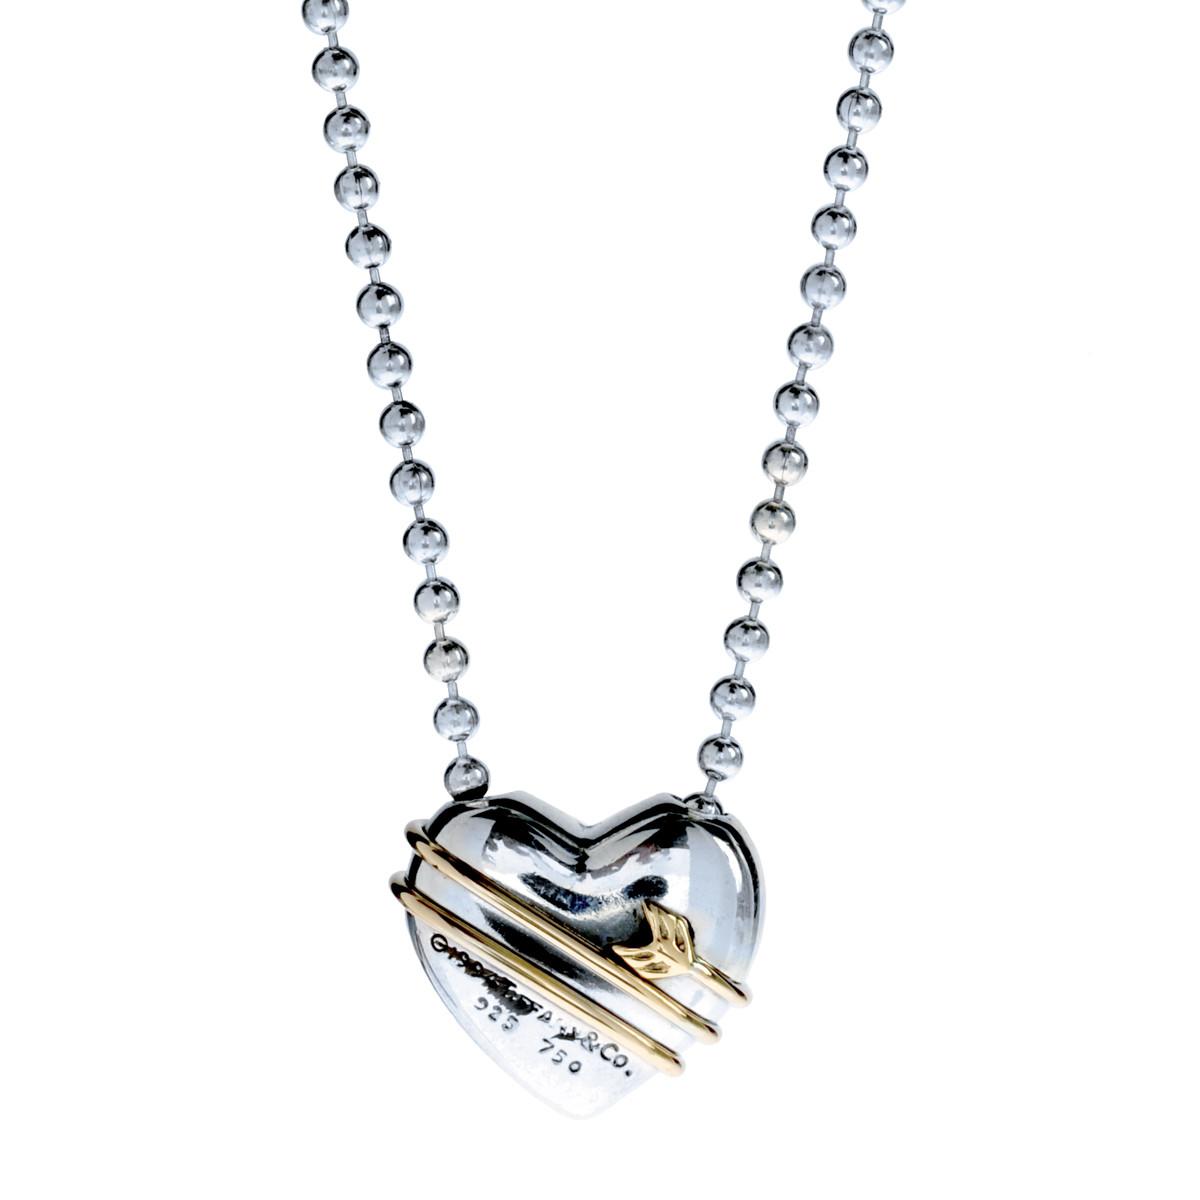 Vintage Tiffany & Co. Puffed Heart & Arrow Pendant